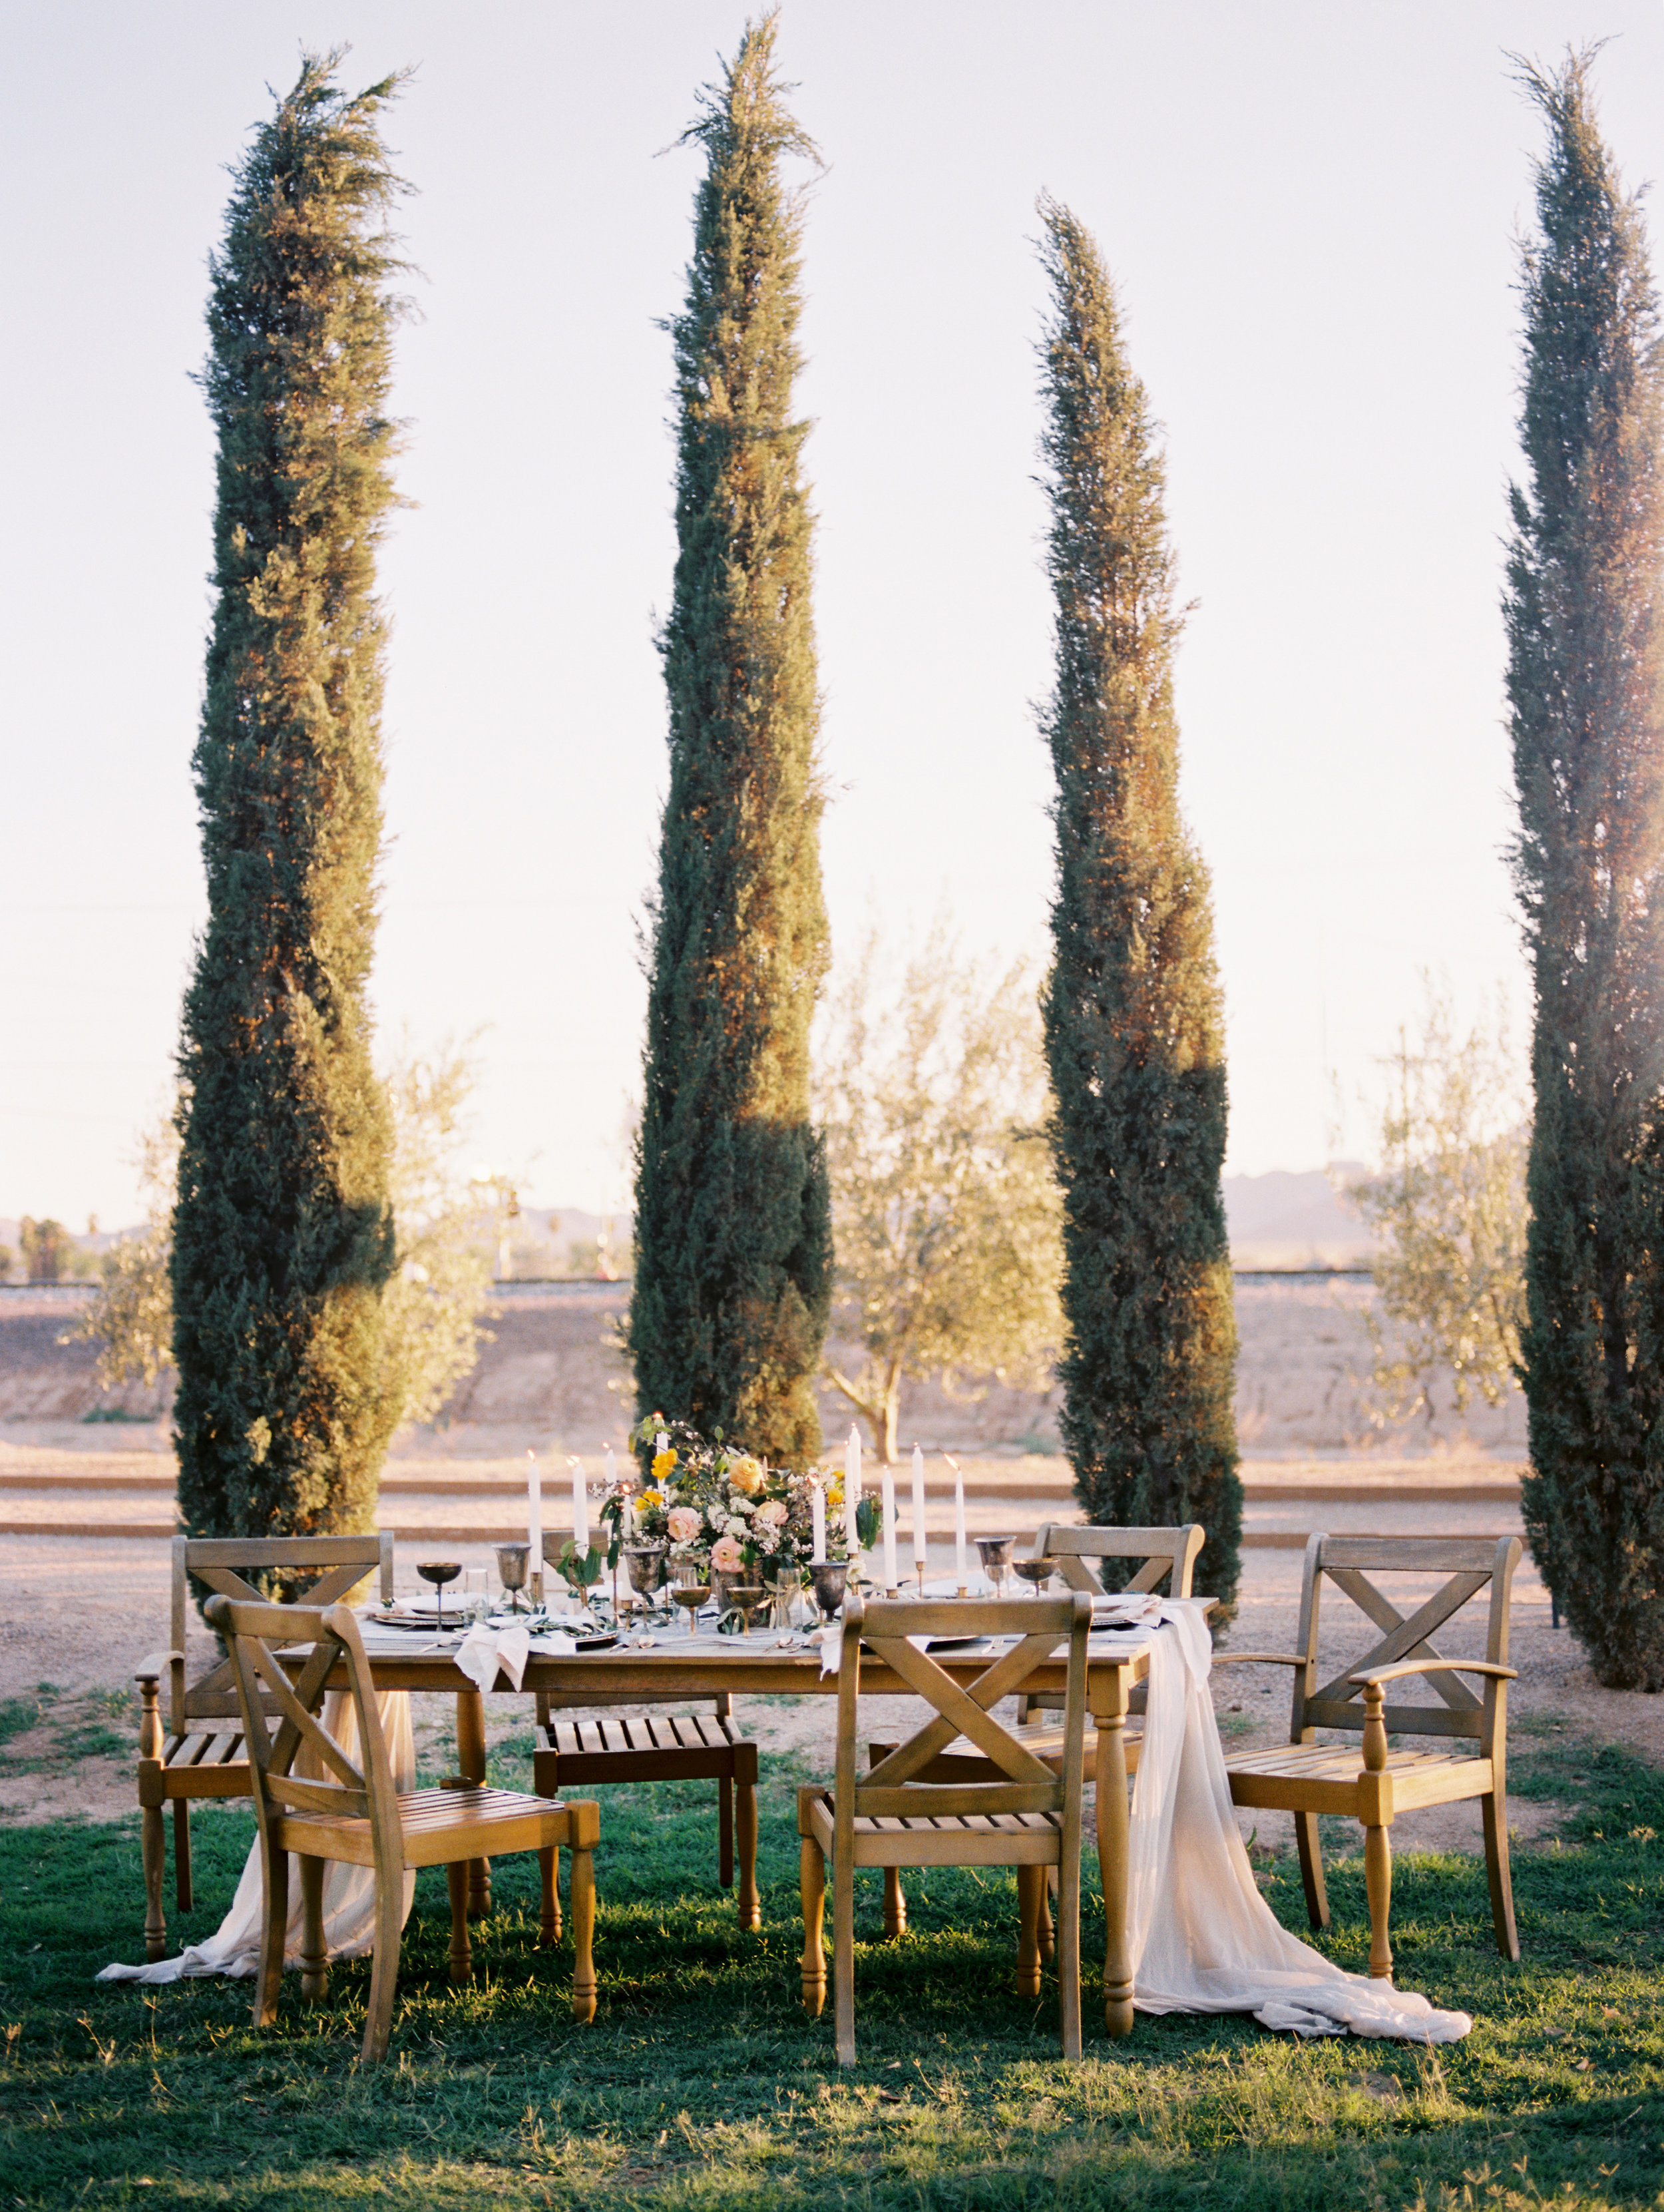 Olive Mill Wedding Inspiration - Reception